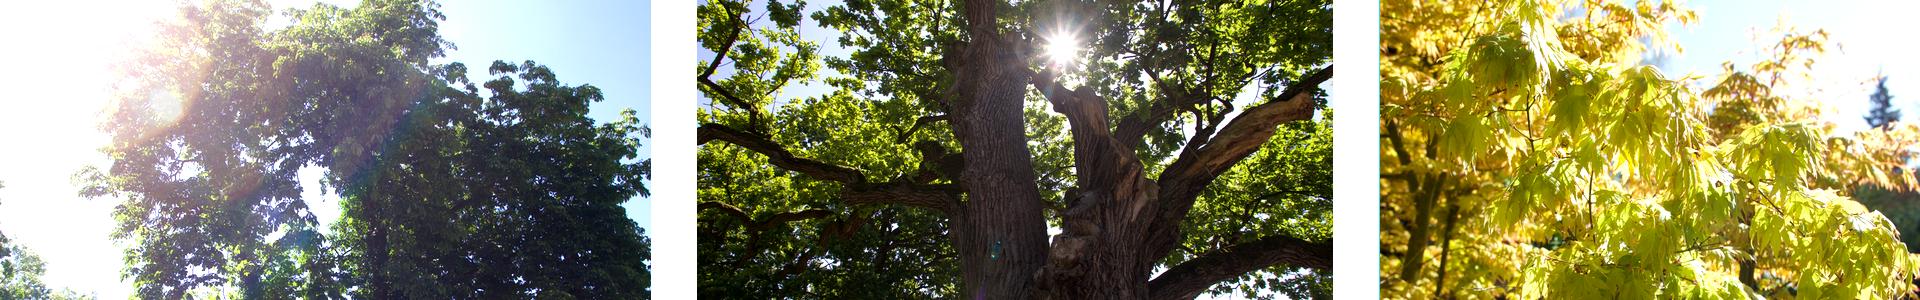 Triplet_Bäume